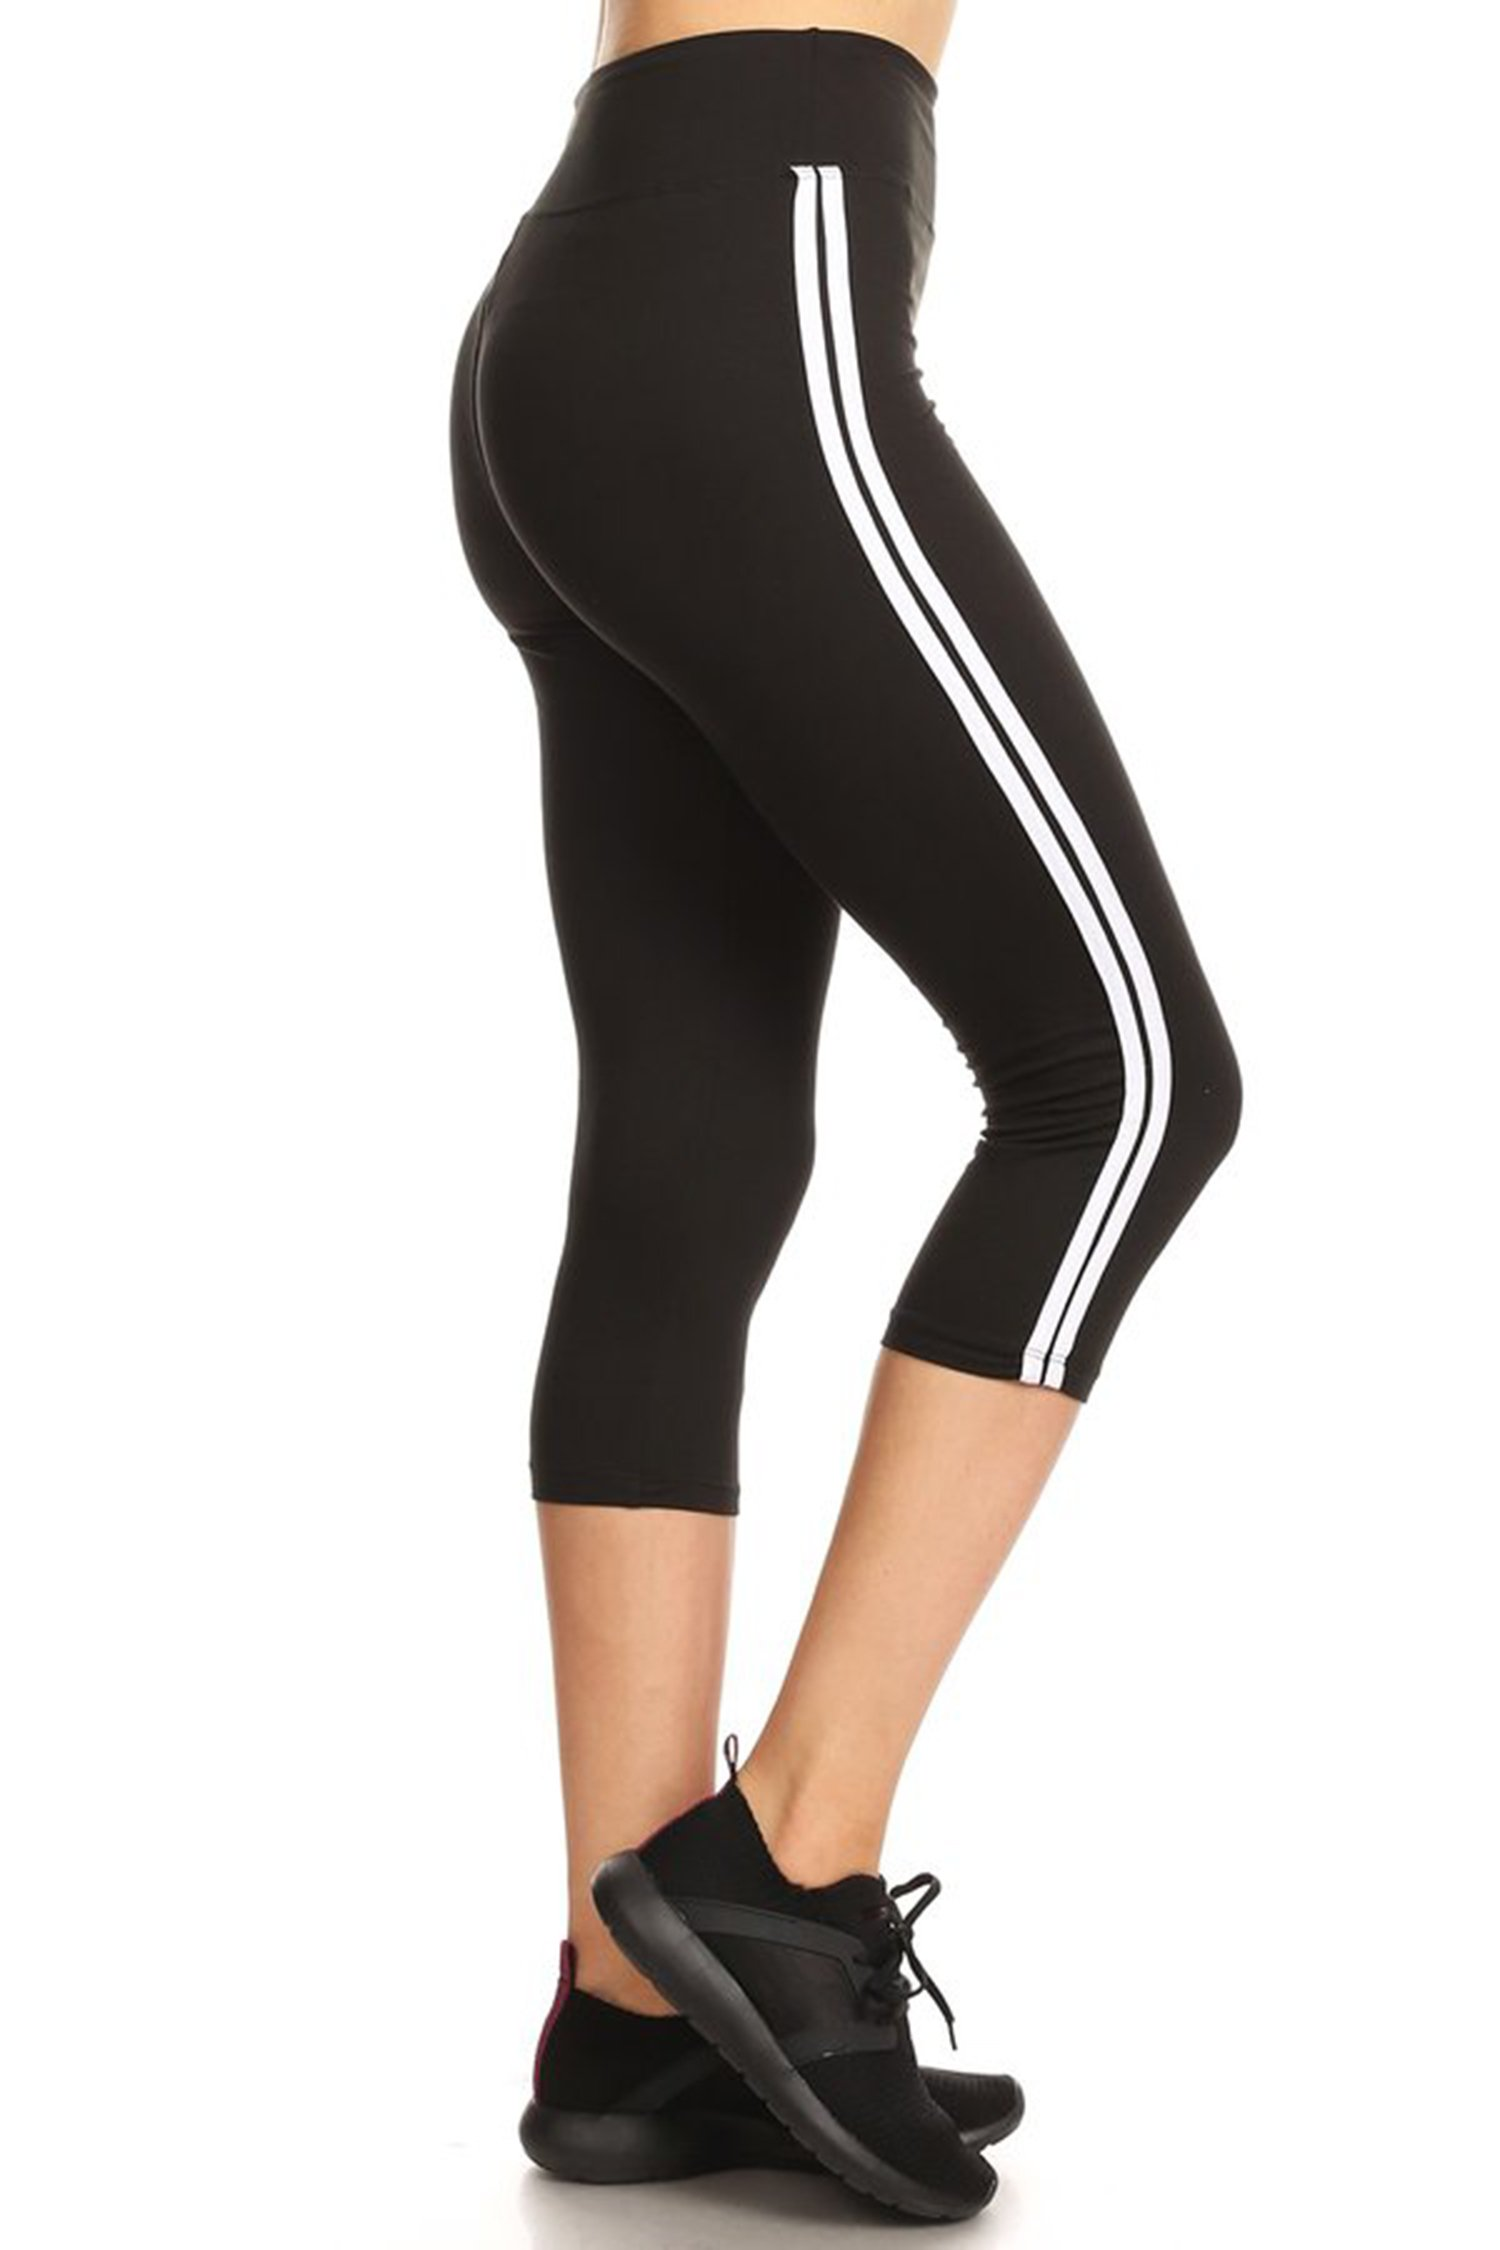 Leggings Mania Women's Plus Cropped Sport Striped High Waistband Leggings Black